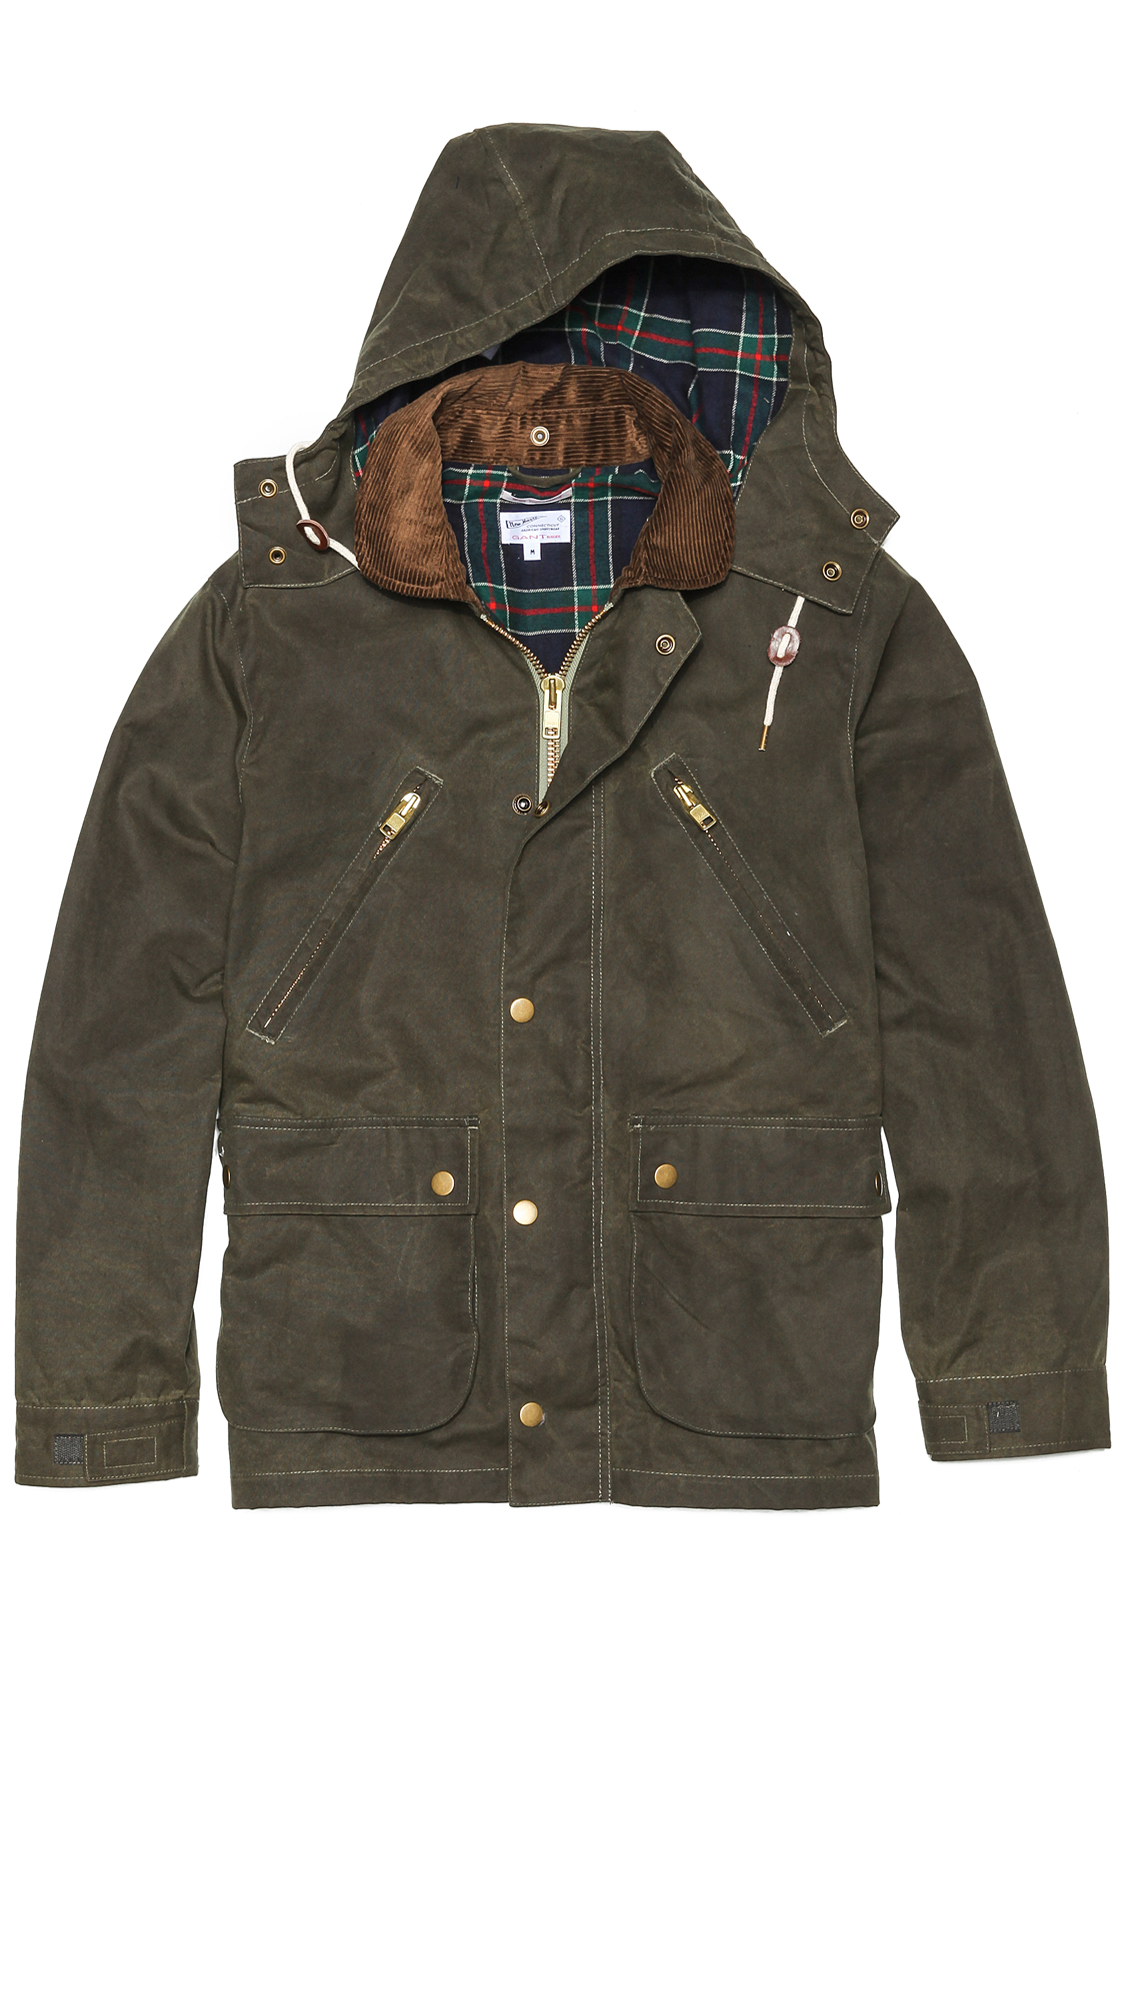 Lyst Gant Rugger Wax Your Back Coat In Green For Men